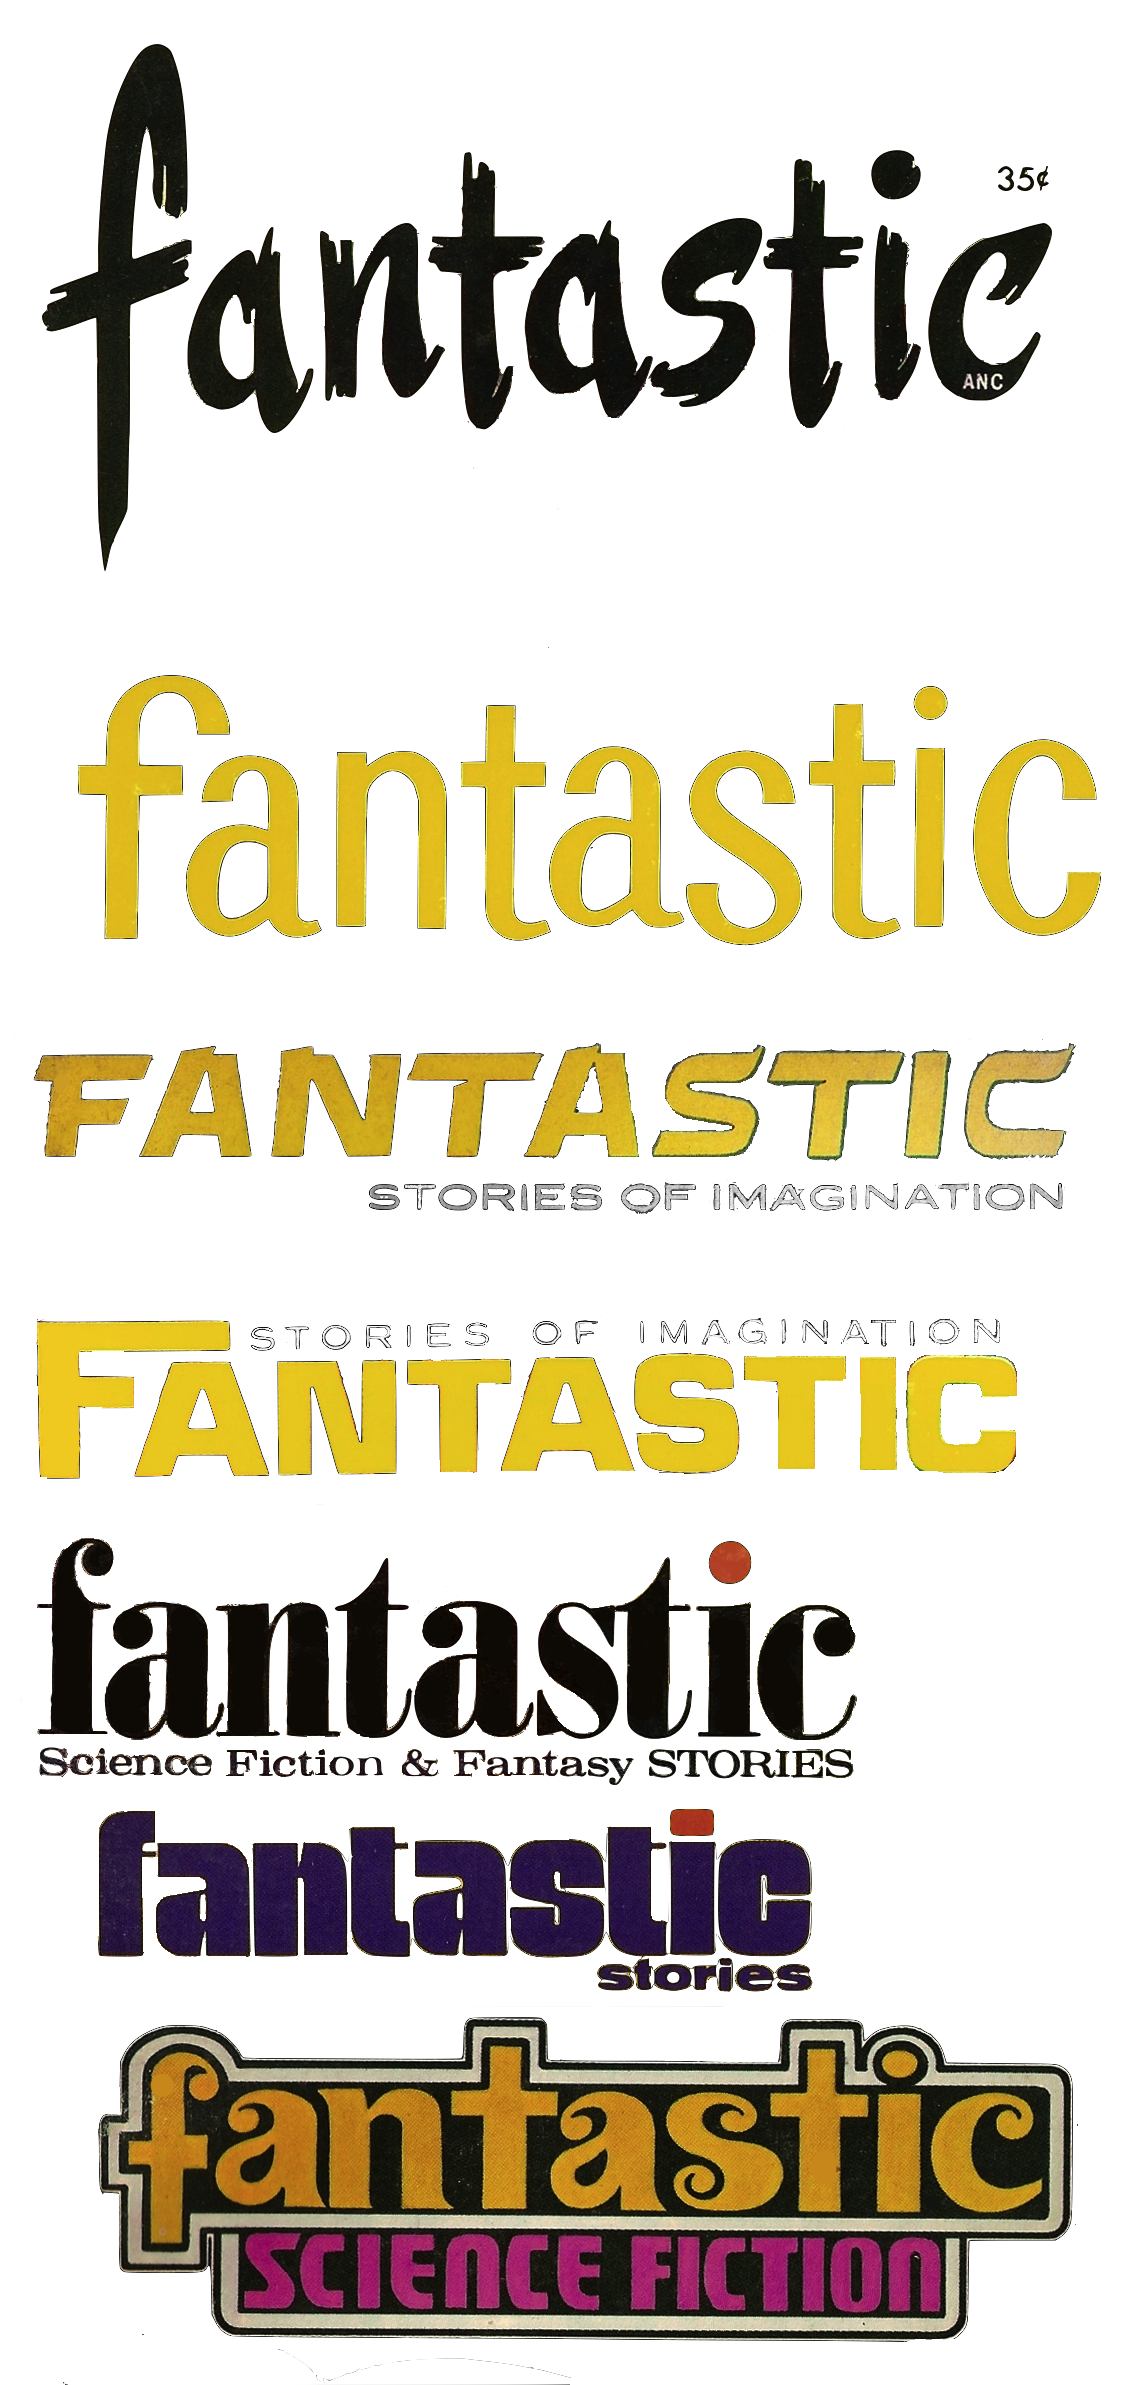 File:Fantastic fonts high res.png.